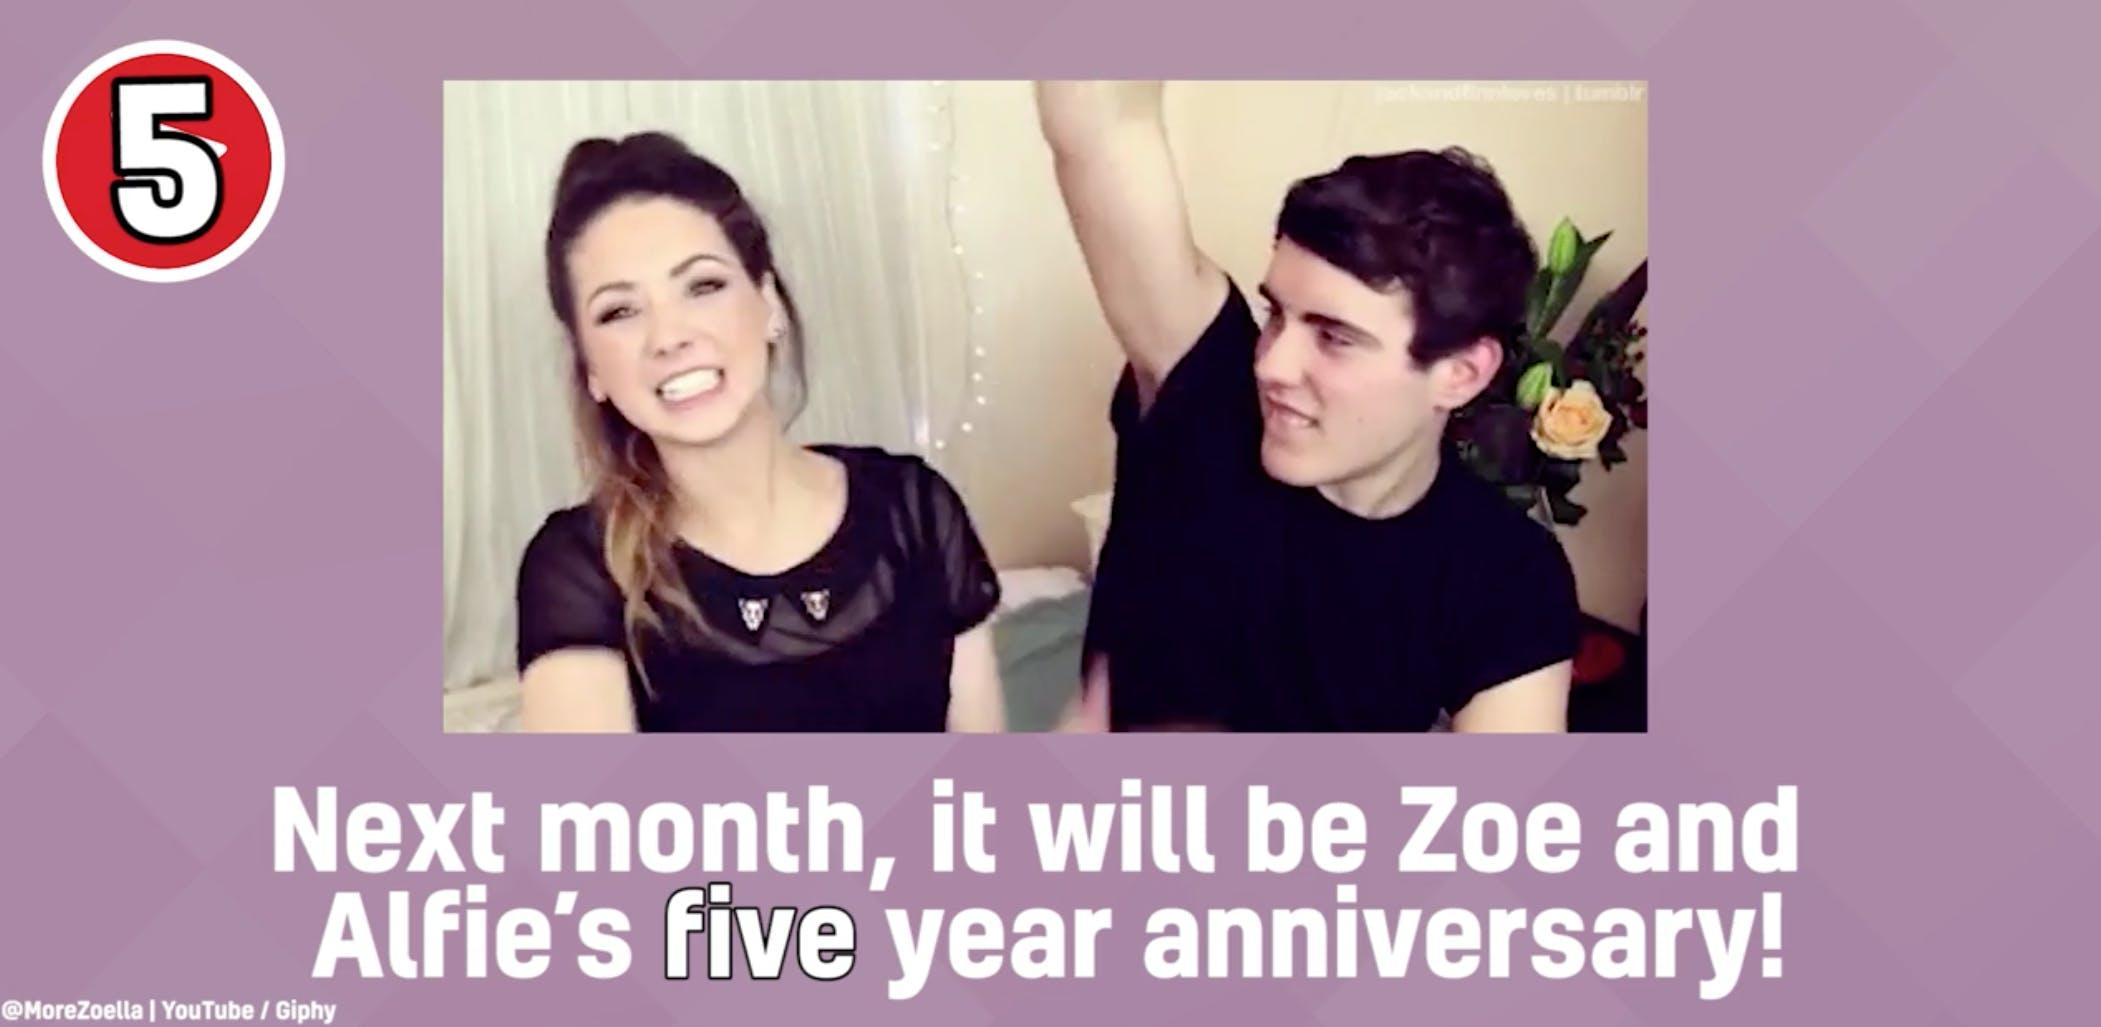 Zoella, YouTube beauty vlogger –and her boyfriend Alfie